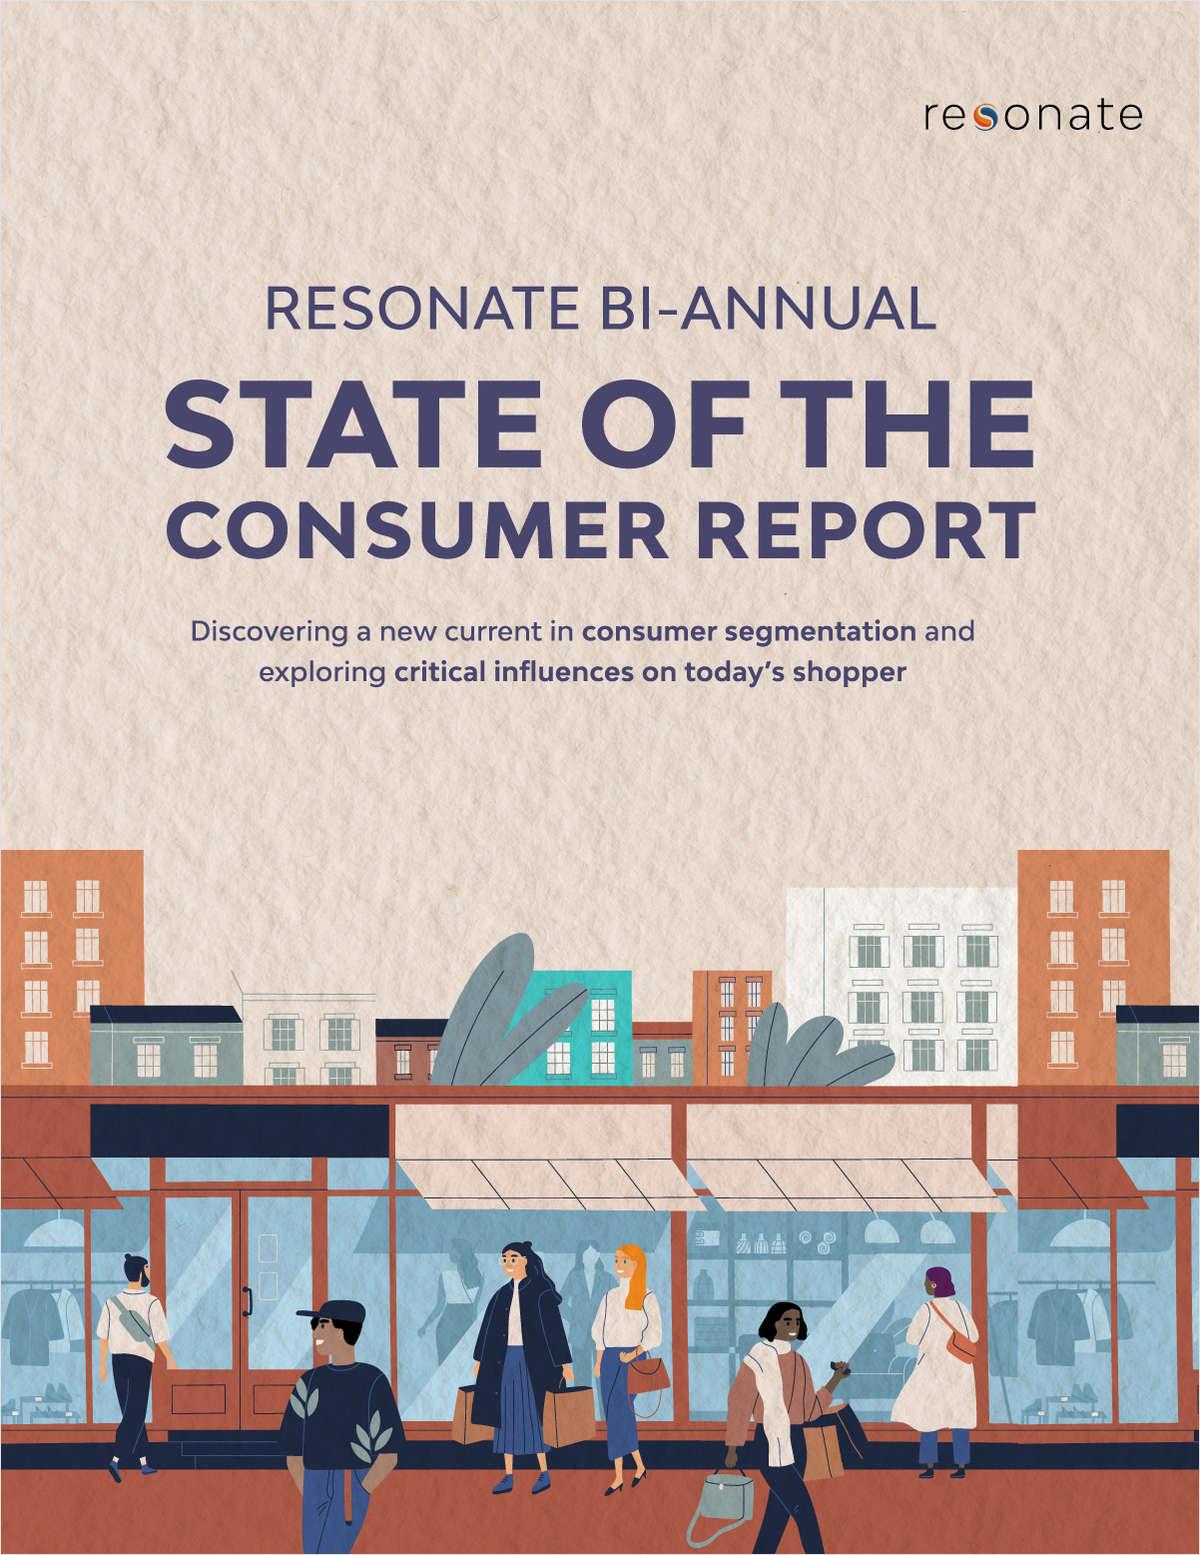 Resonate Bi-Annual State of the Consumer Report: 2H 2019